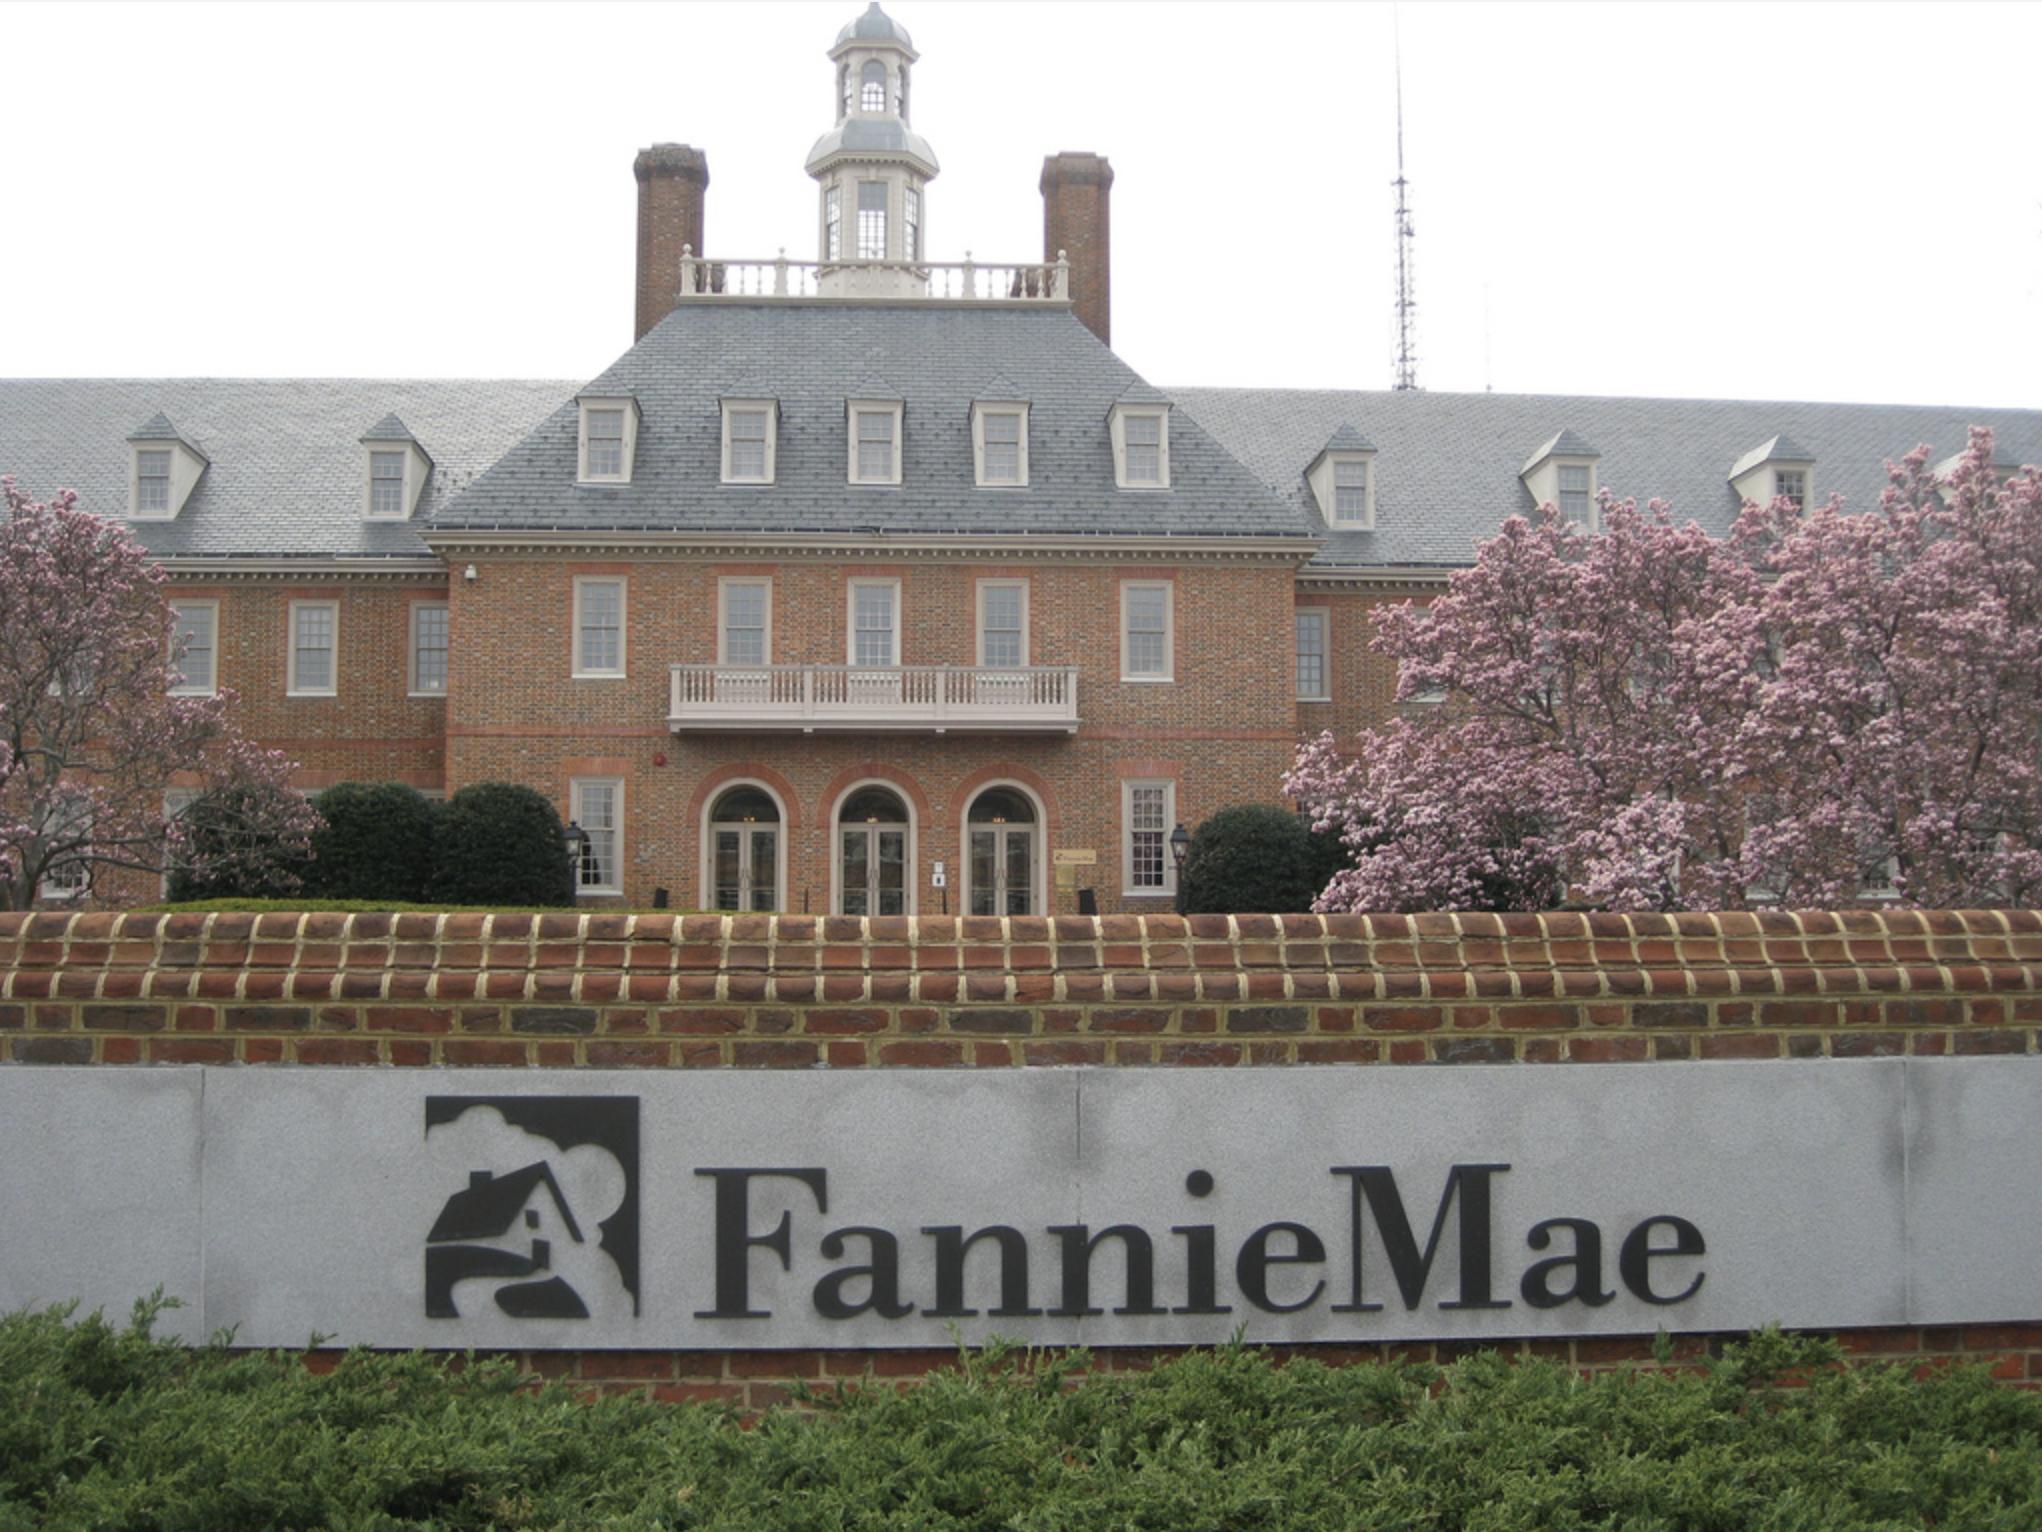 Fannie Mae and Freddie Mac Should Be Shut Down, Not Resuscitated